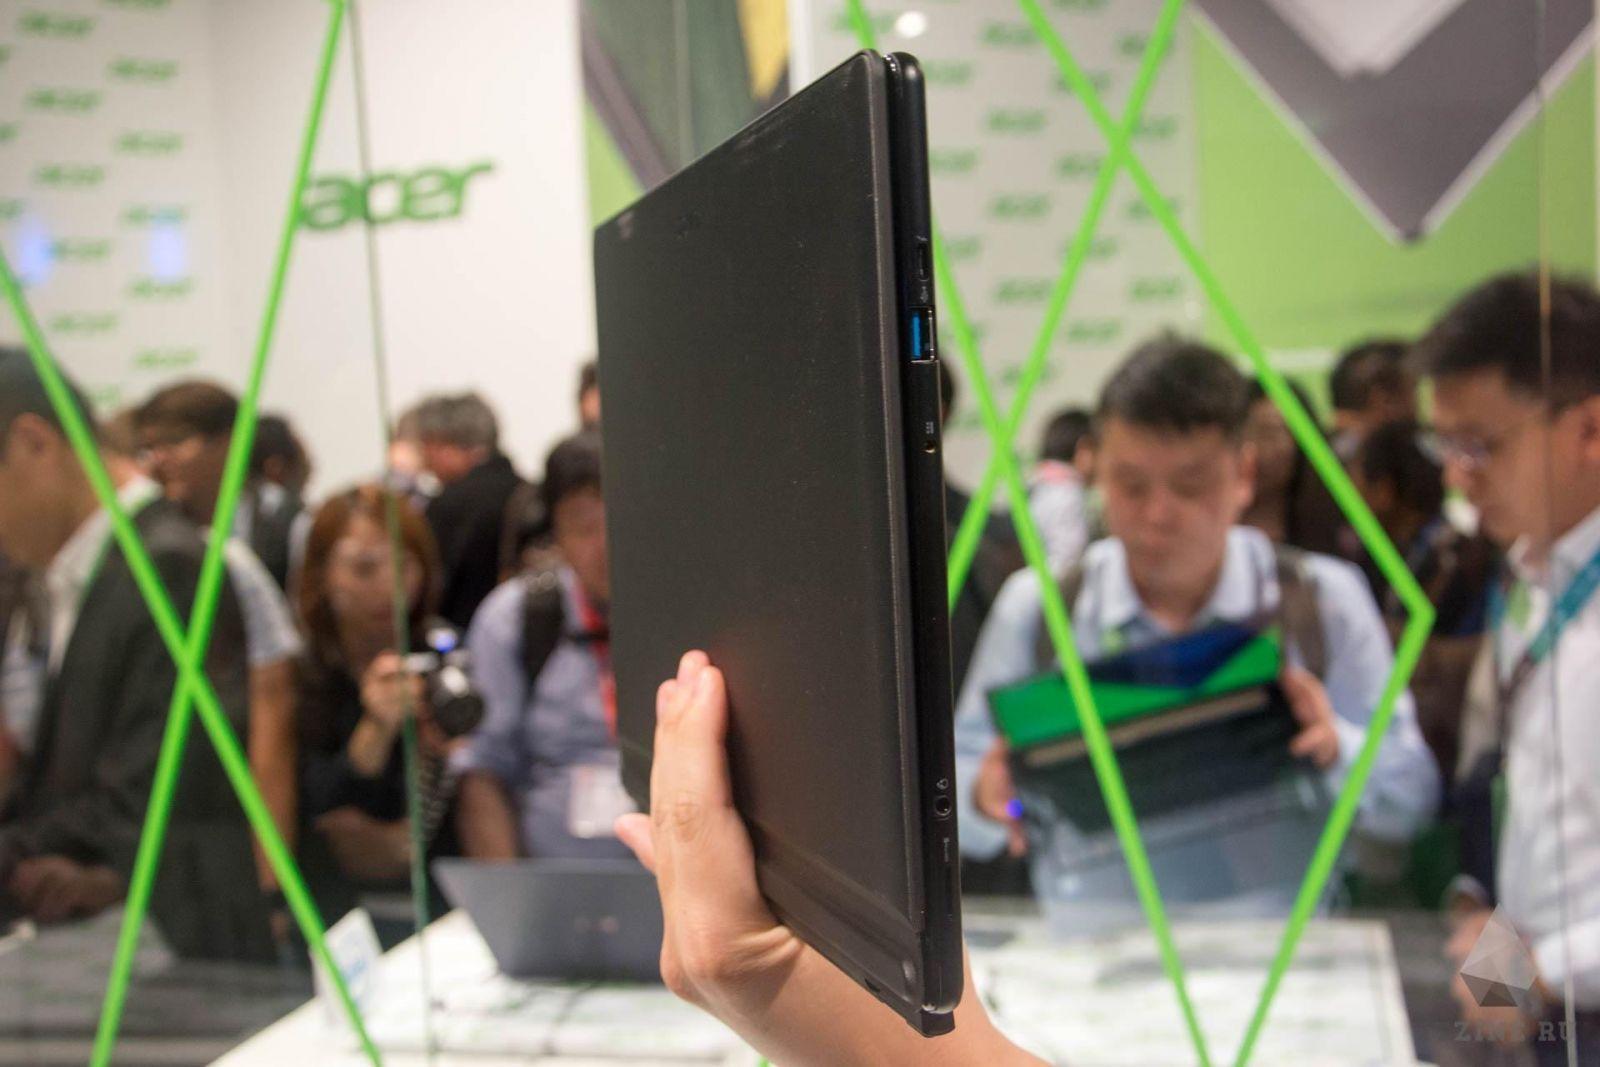 Вид сбоку на Acer Switch 7